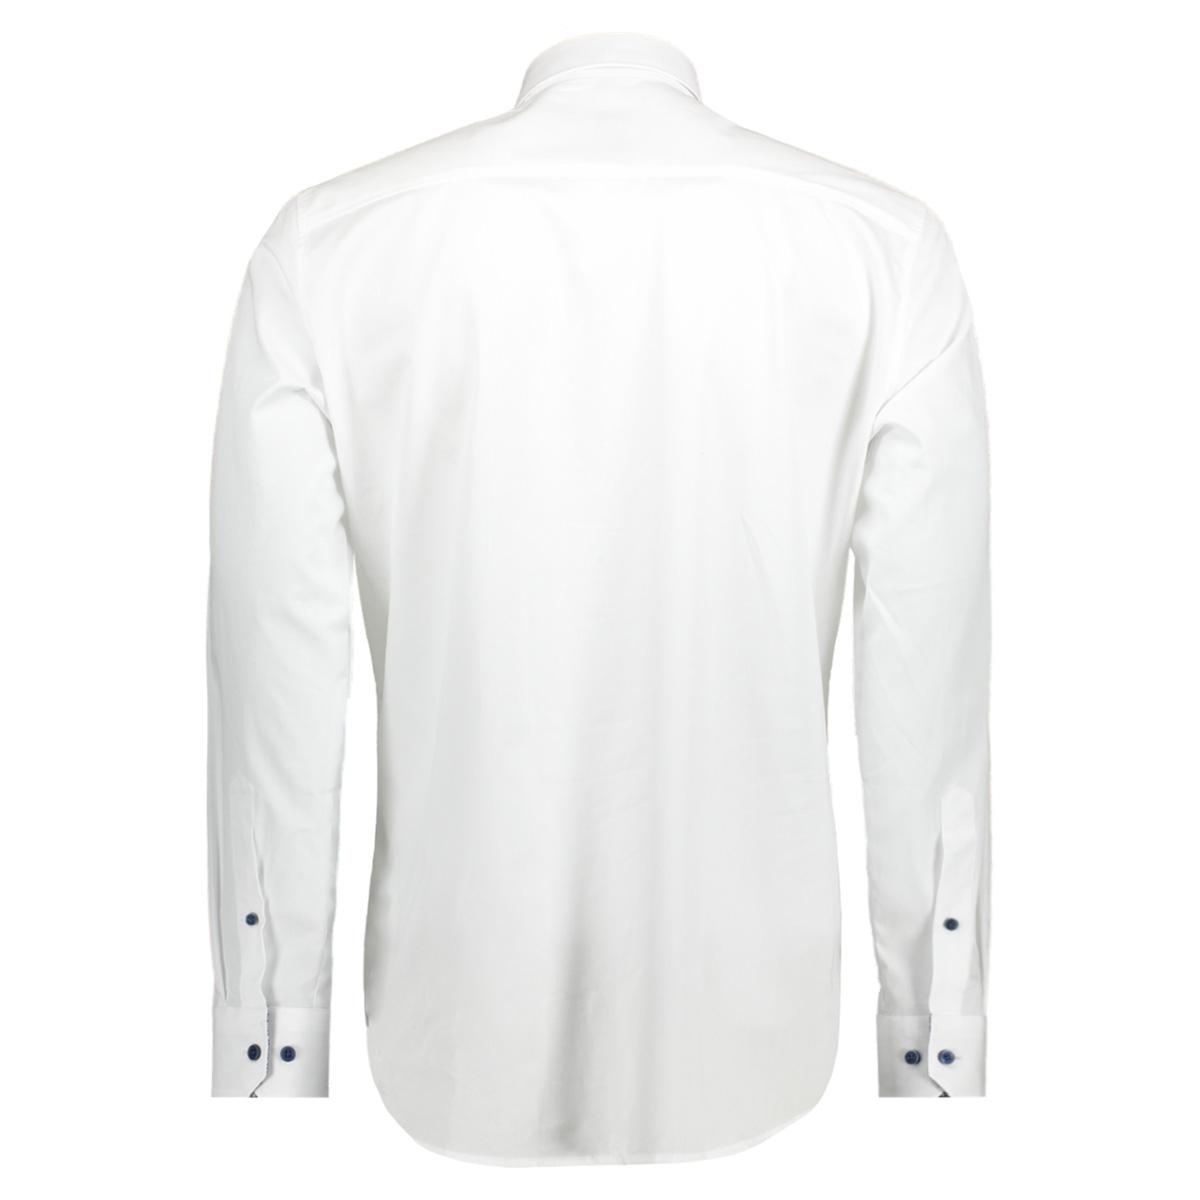 0051 8046 haupt overhemd 01